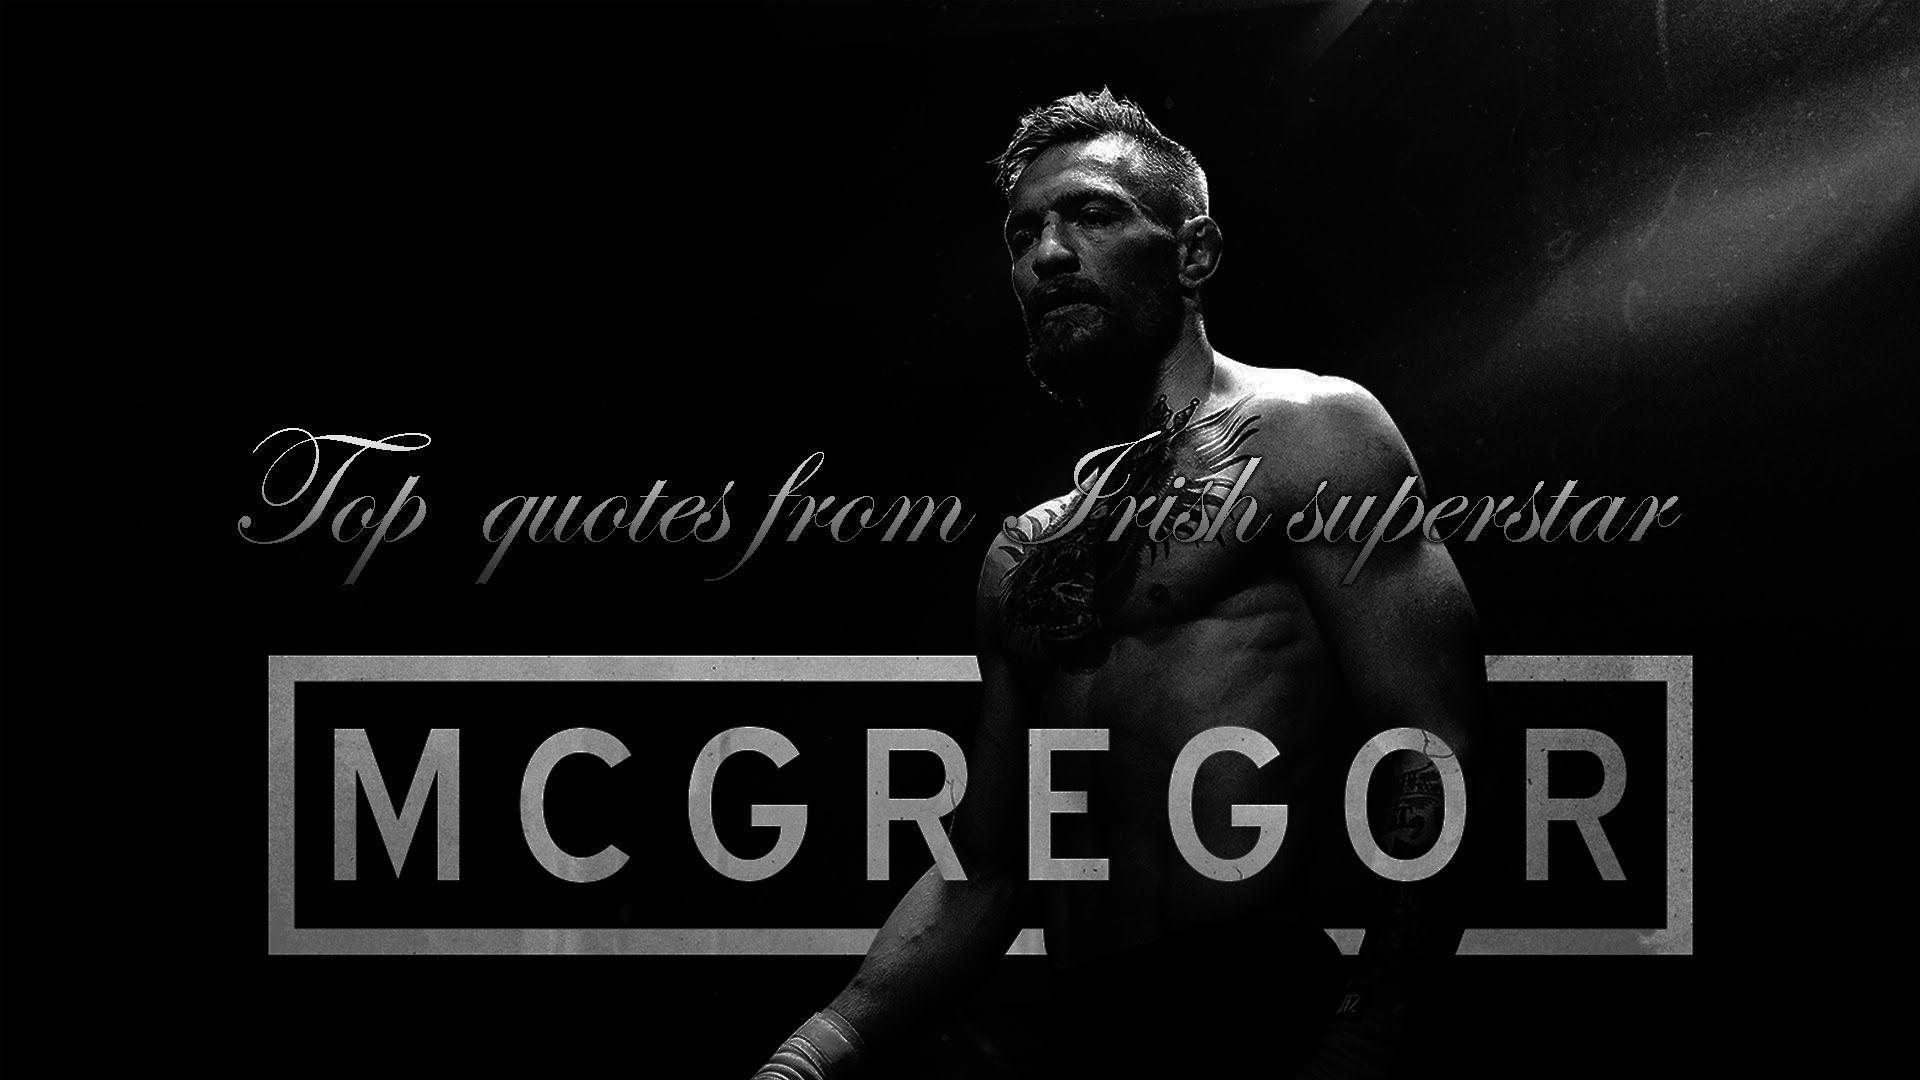 Conor Mcgregor Quotes Wallpaper Picture Desktop Wallpaper Box Mcgregor Wallpapers Conor Mcgregor Wallpaper Conor Mcgregor